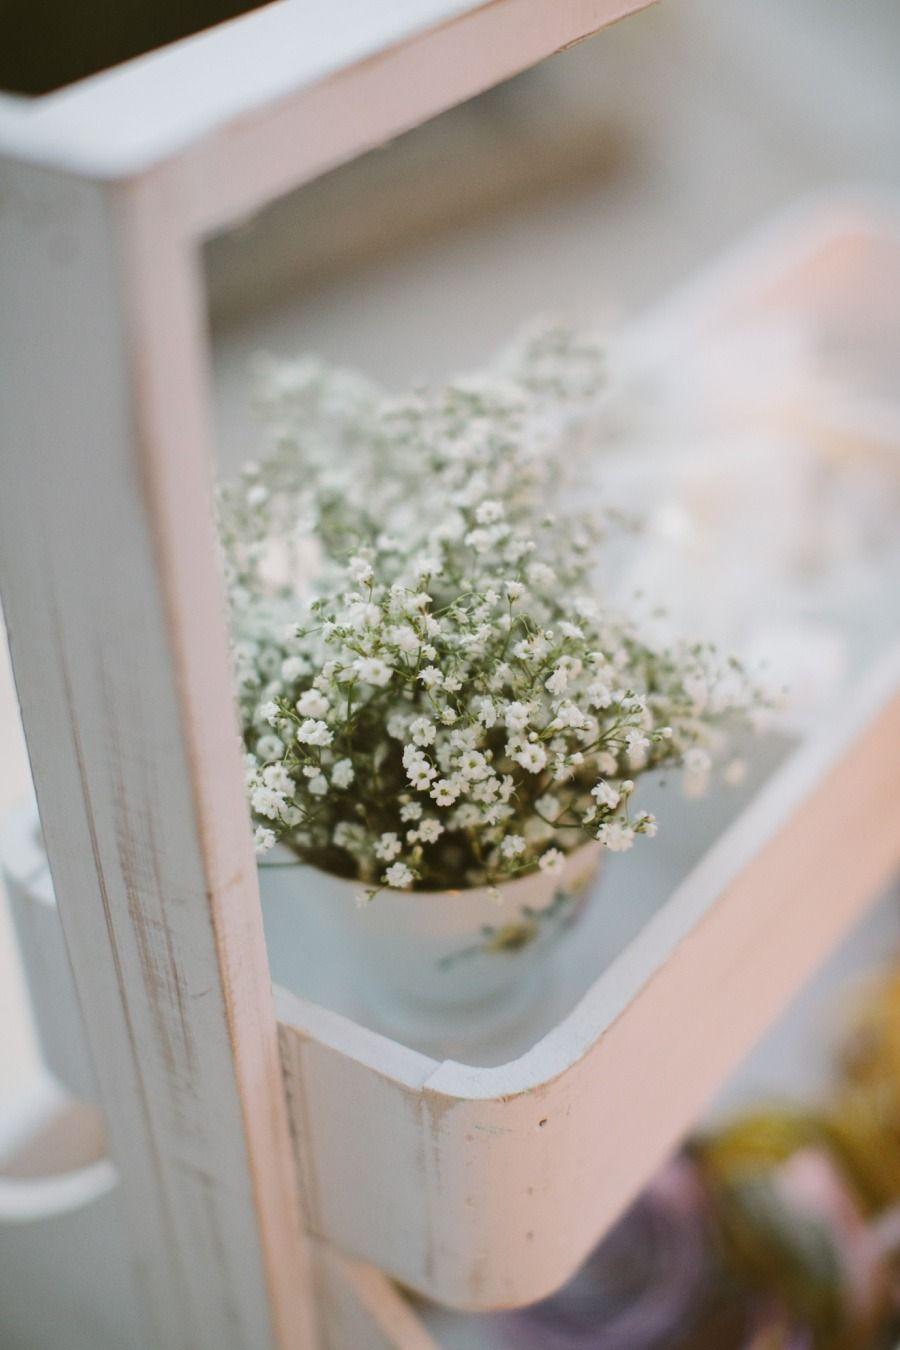 Teacup & baby's breath  #white #vintage #chic   Photography: Paula O'Hara - www.paulaohara.com/  Read More: http://www.stylemepretty.com/2015/02/11/elegant-pink-gold-malta-wedding/